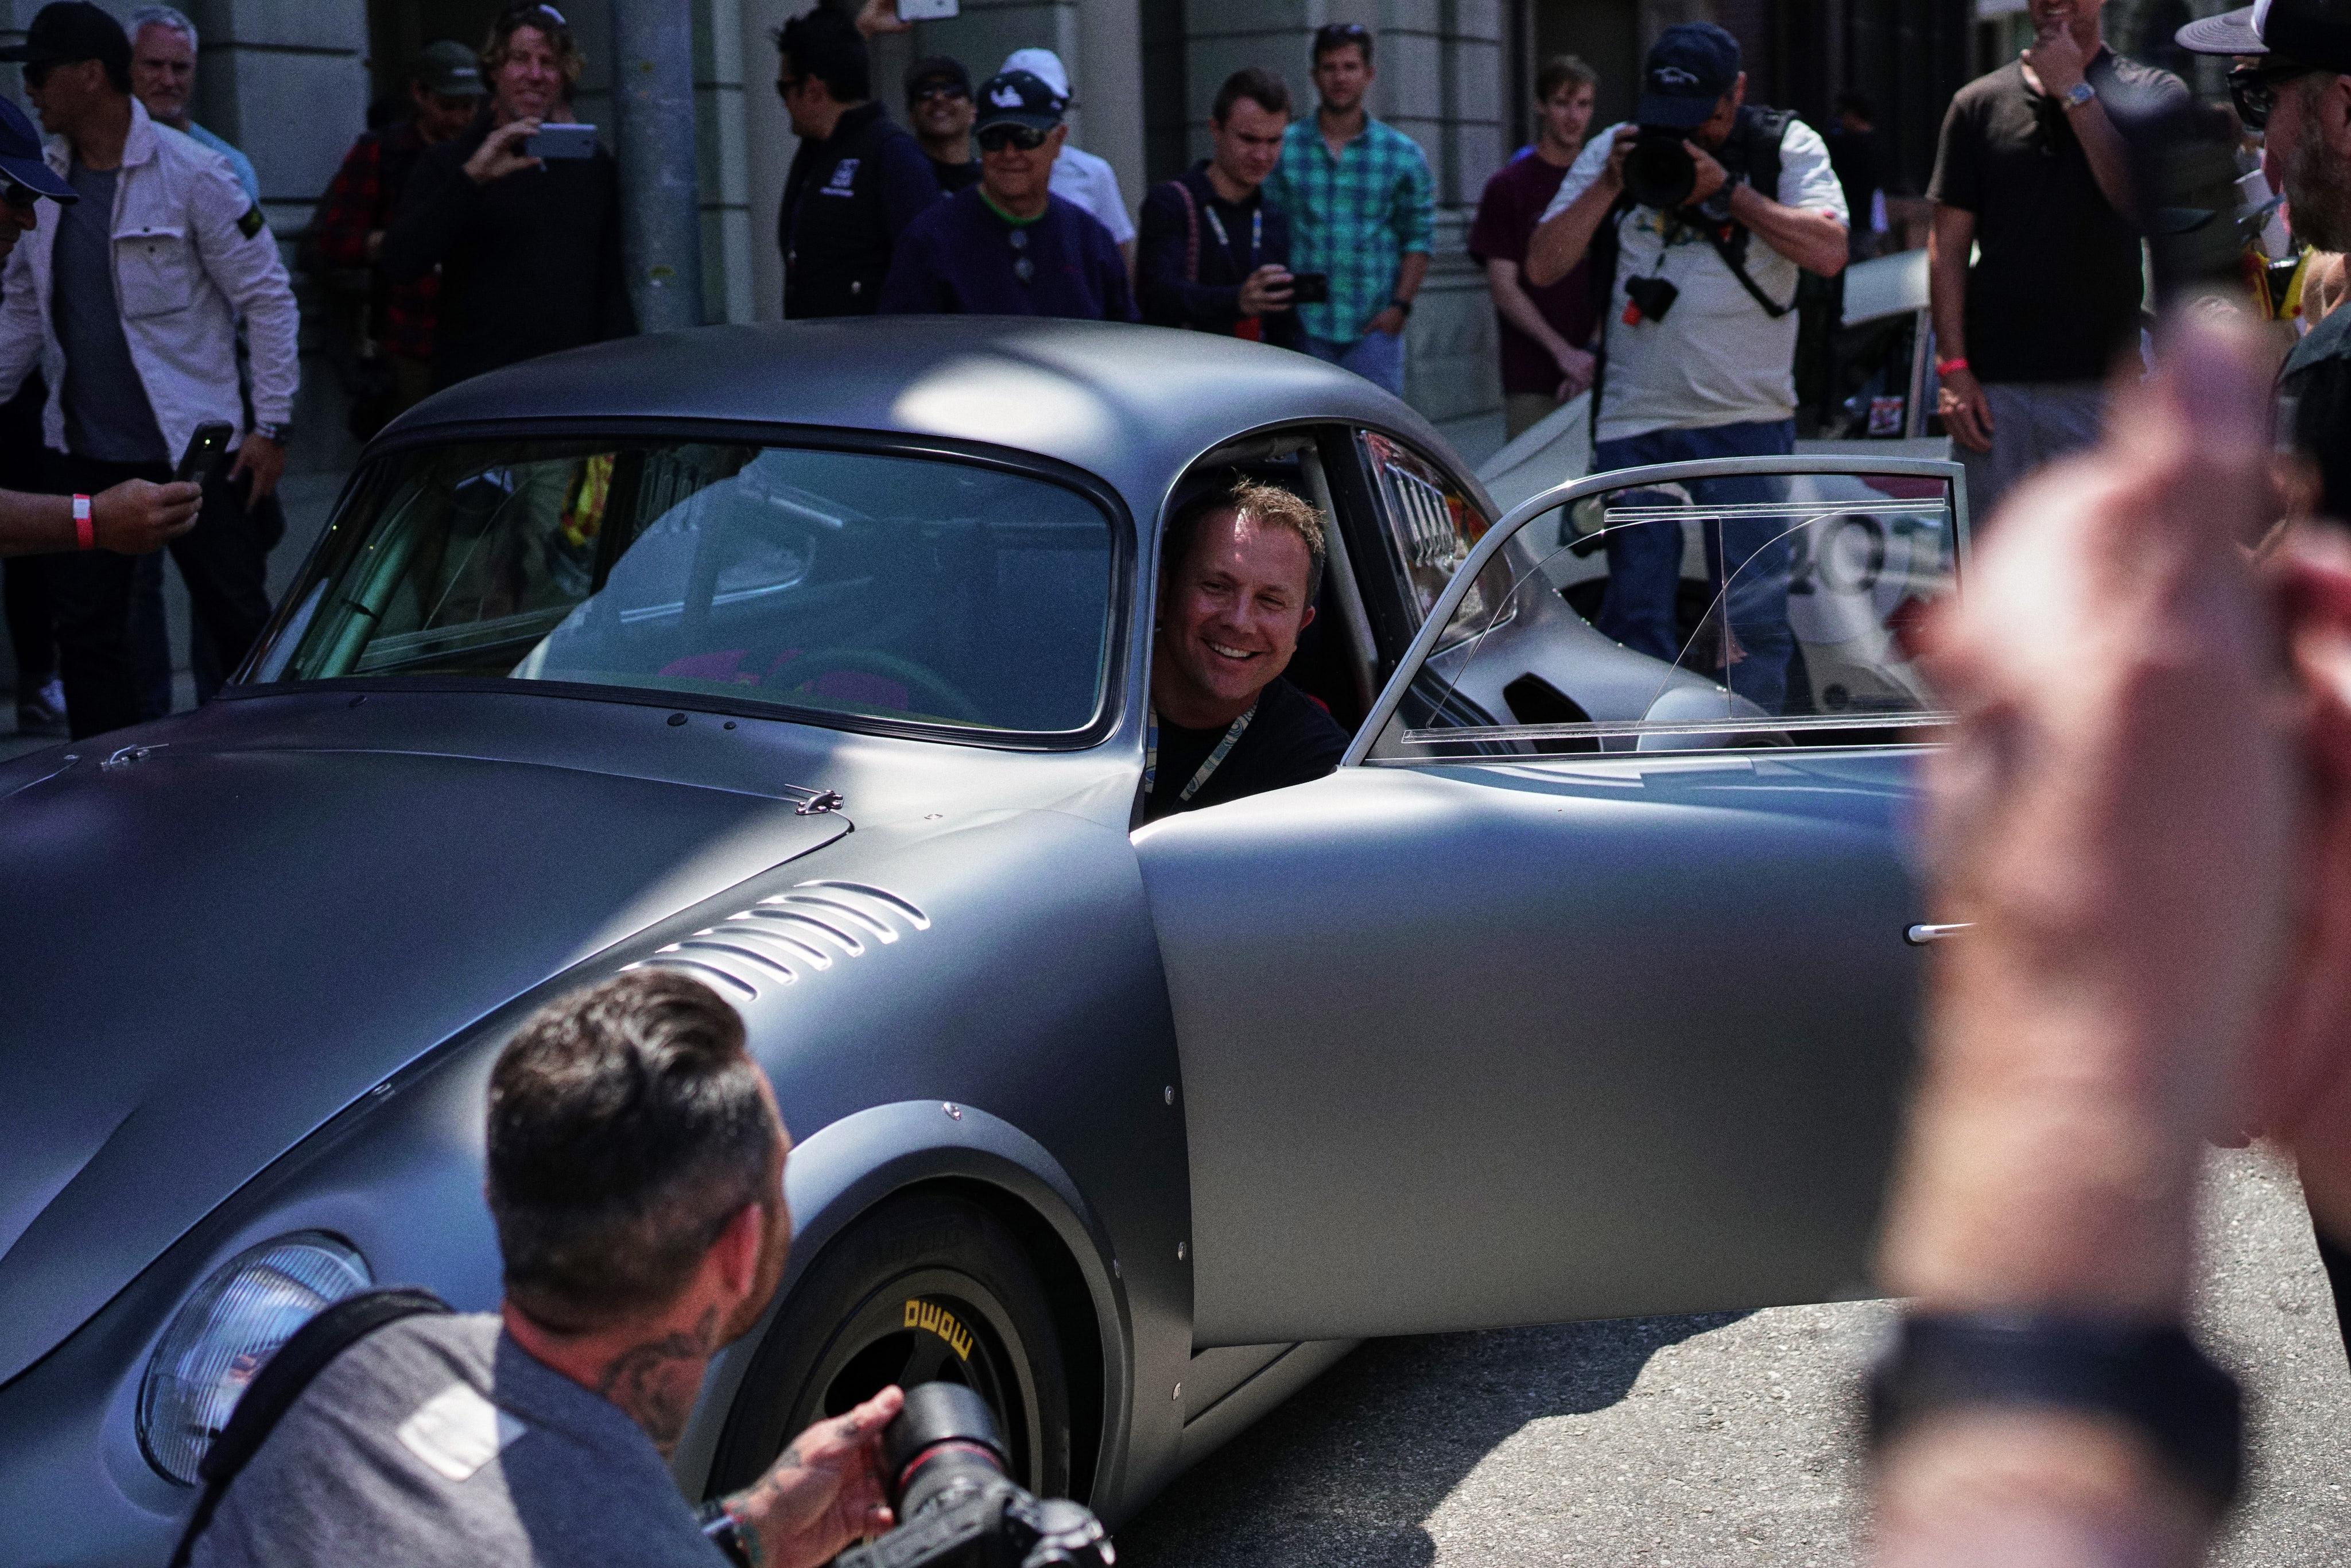 Luftgekühlt-6-Rennen-50-Porsche-356-1960-RSR-Rod-Emory-Special